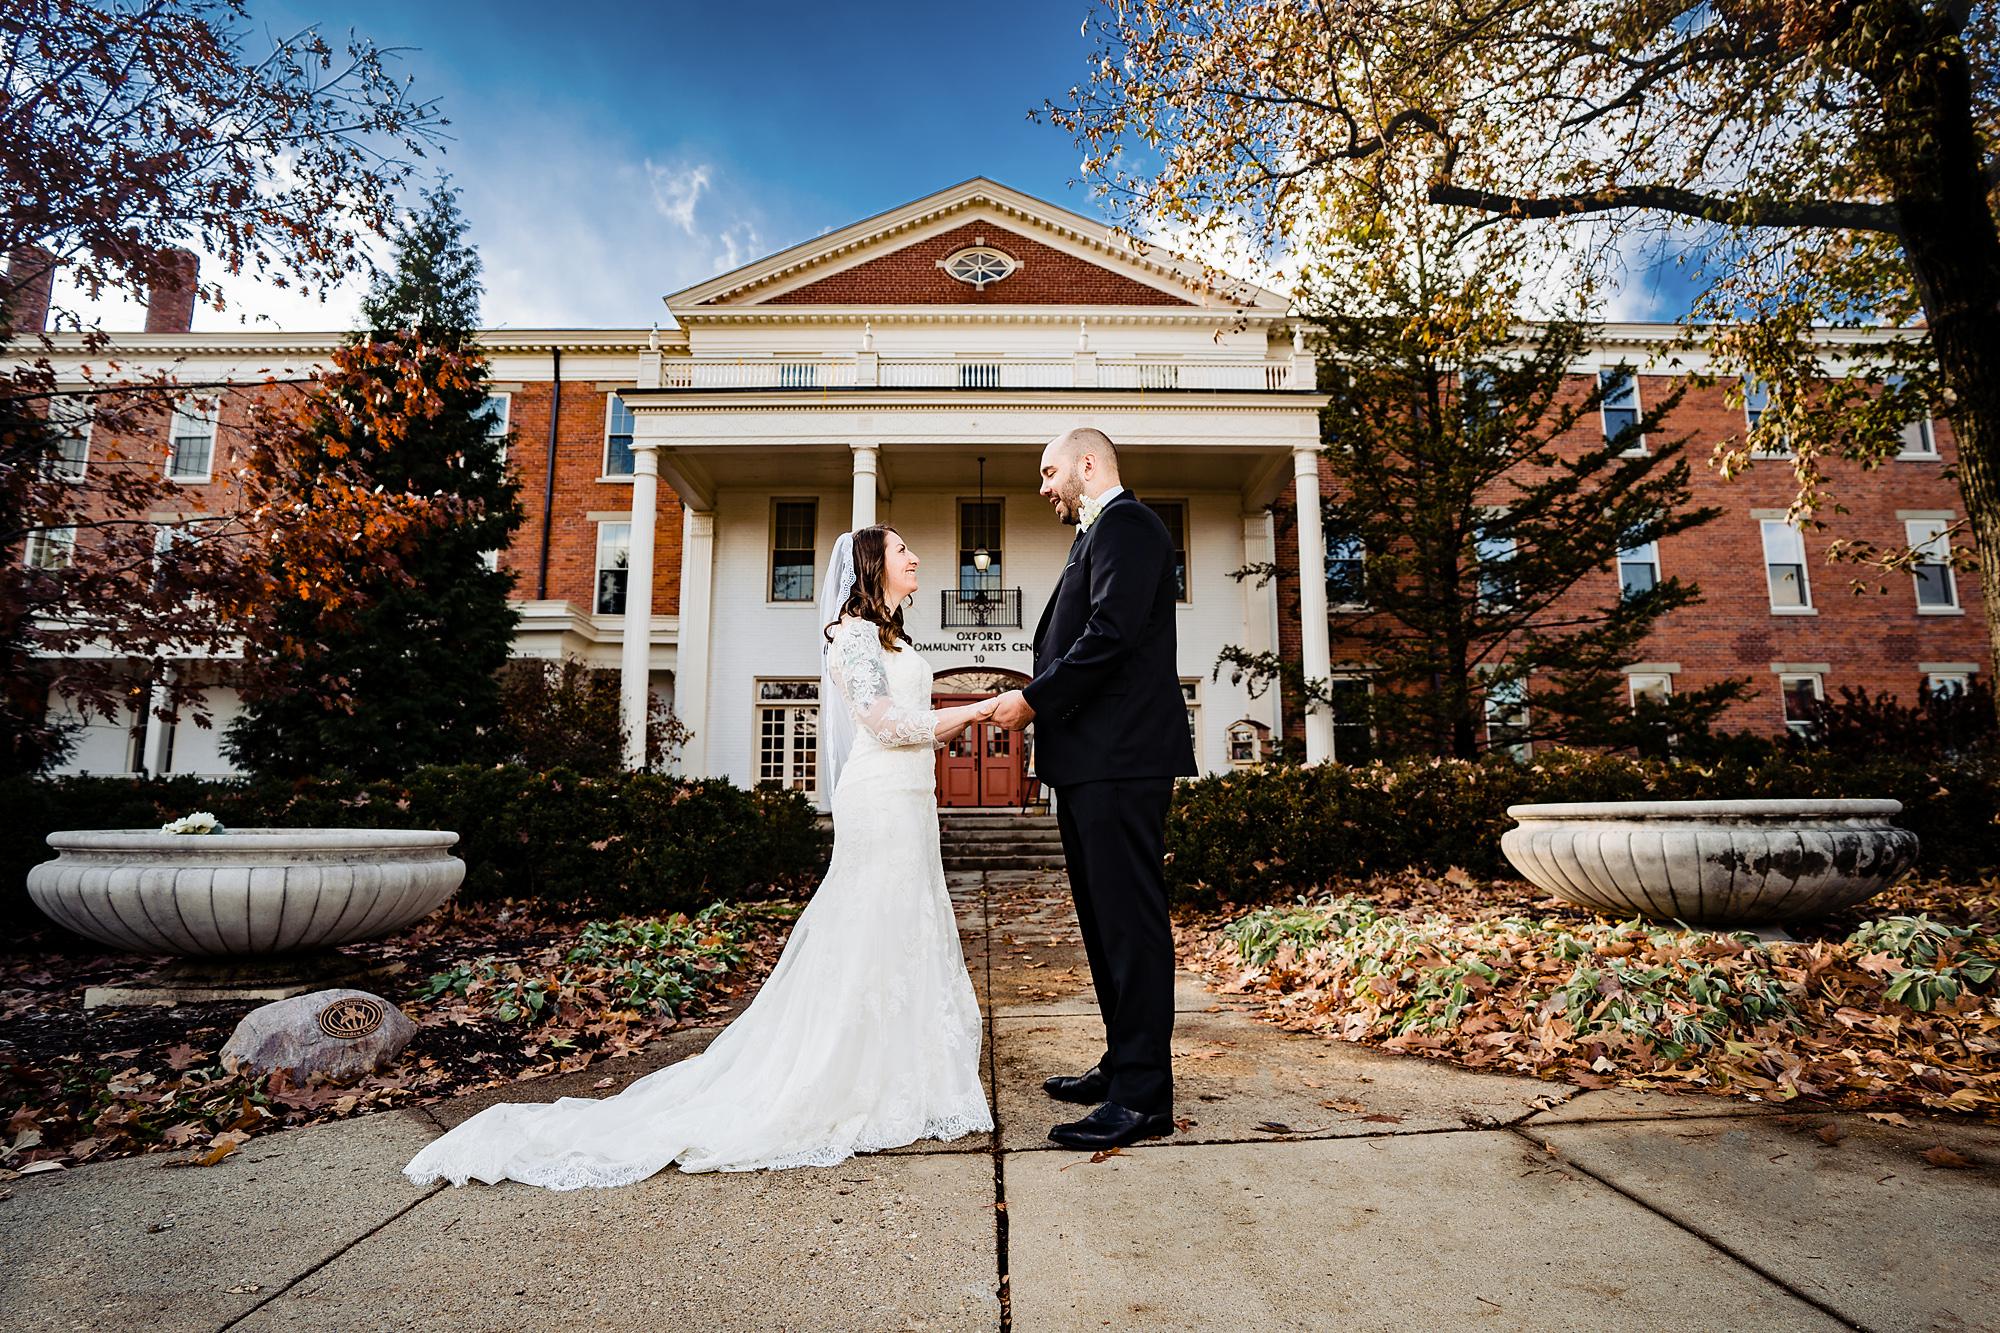 Oxford-Community-Arts-Center-Wedding-Photography-4.jpg